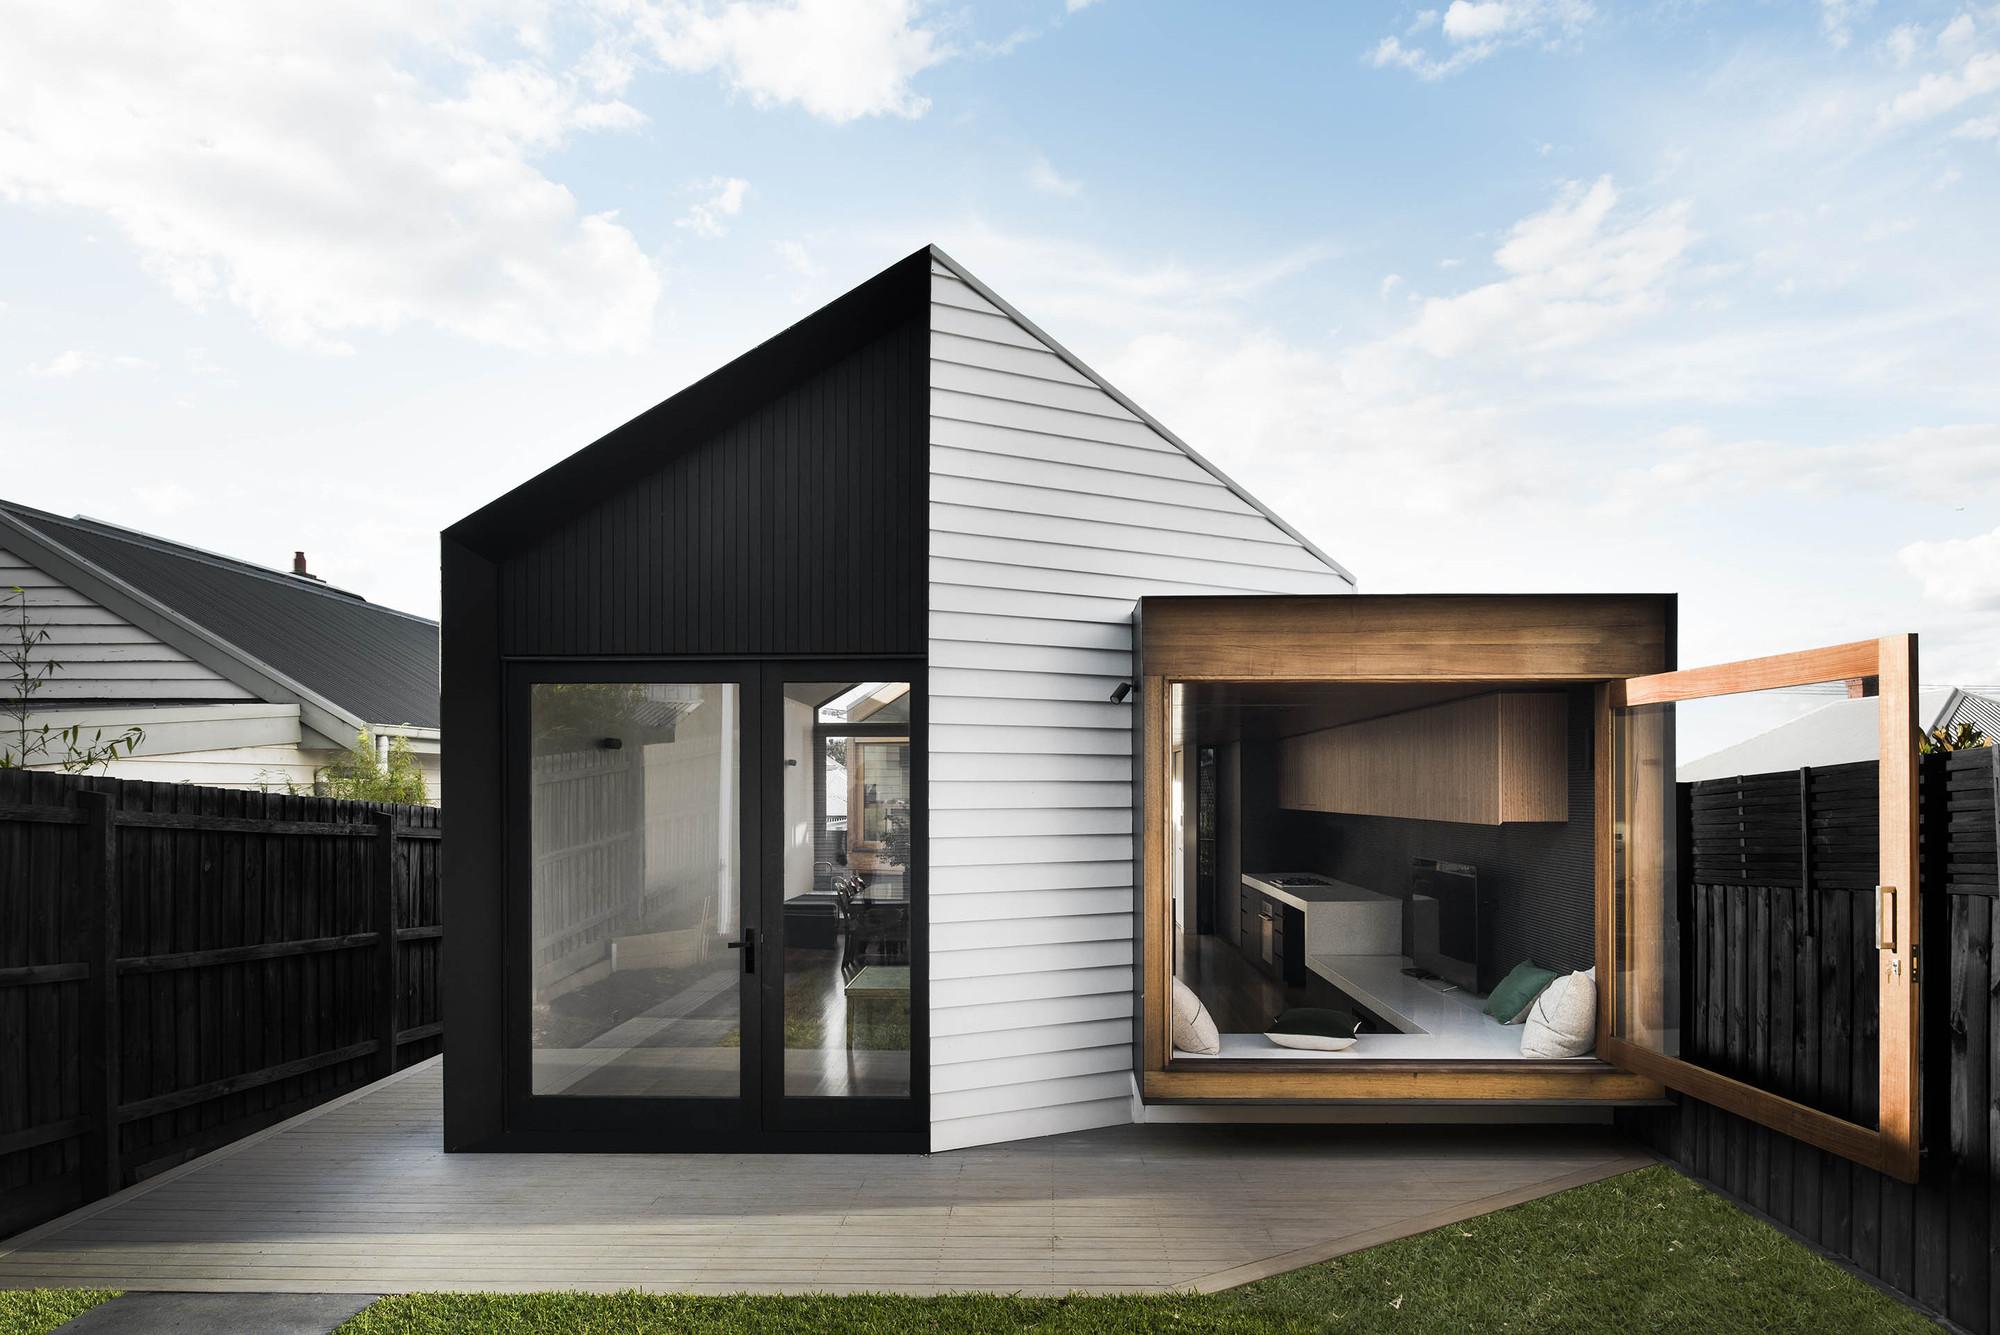 Datum House / FIGR Architecture & Design | ArchDaily